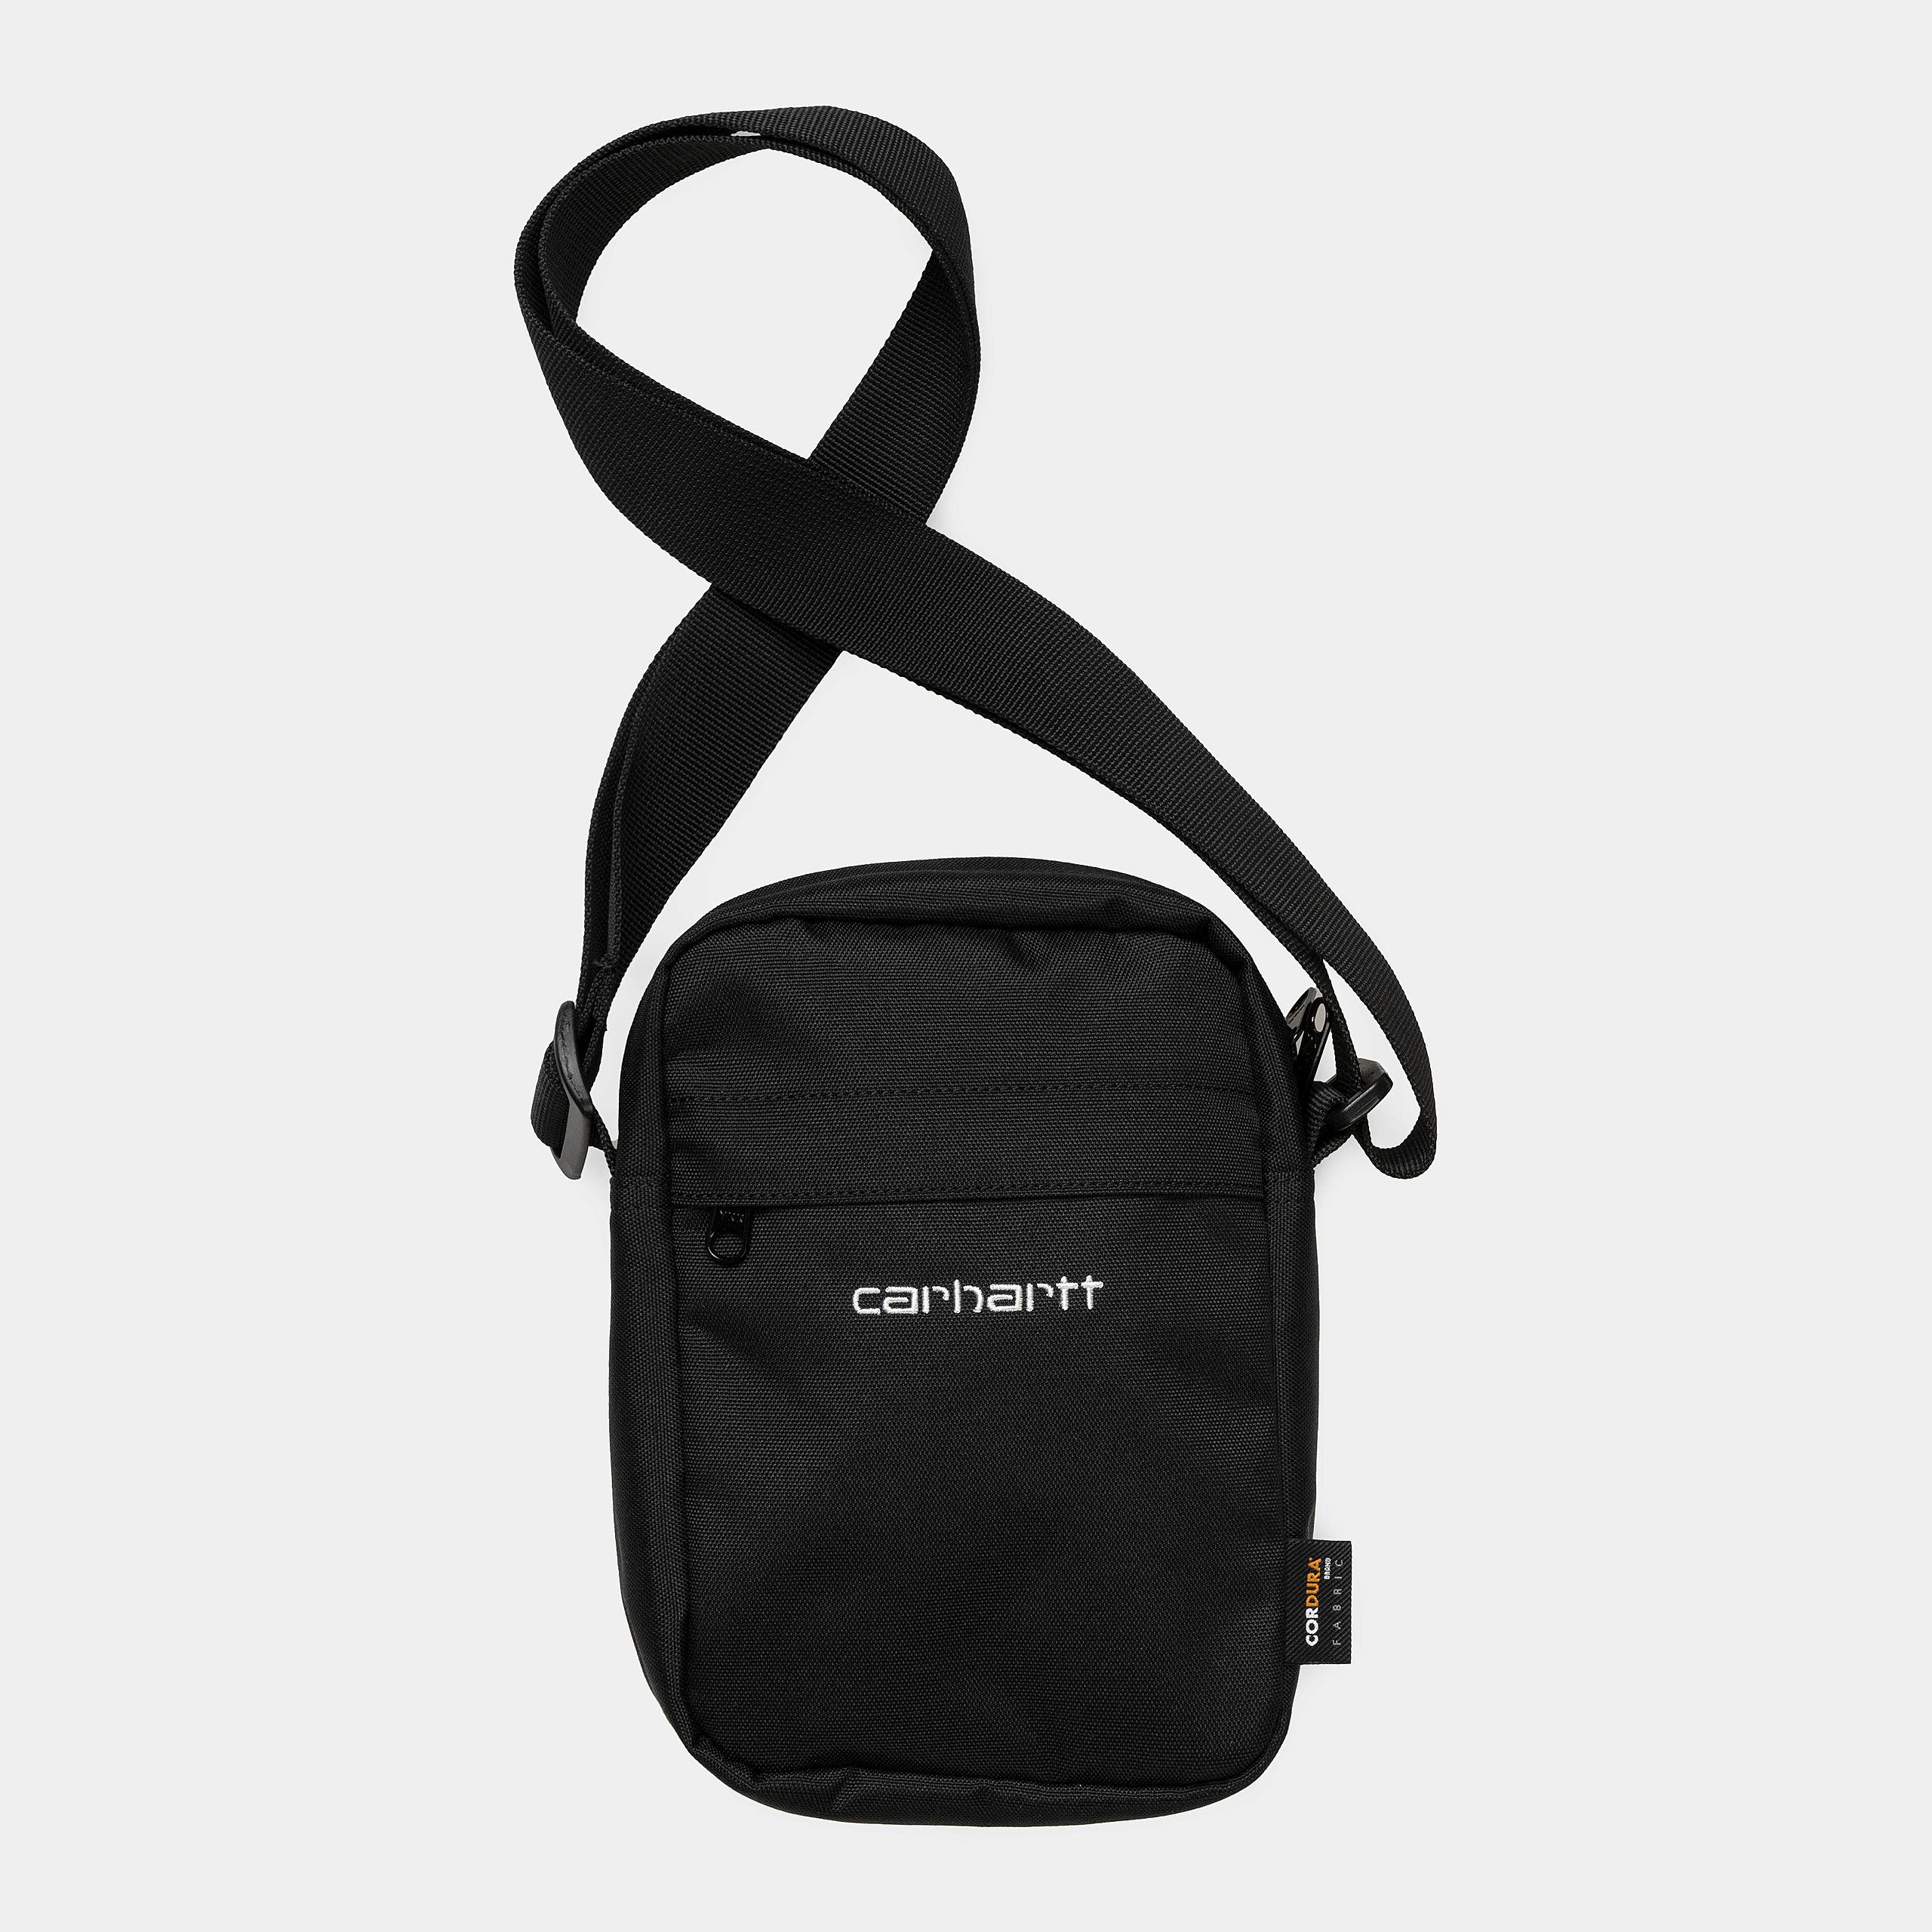 Carhartt WIP - PAYTON SHOULDER POUCH - Black/White